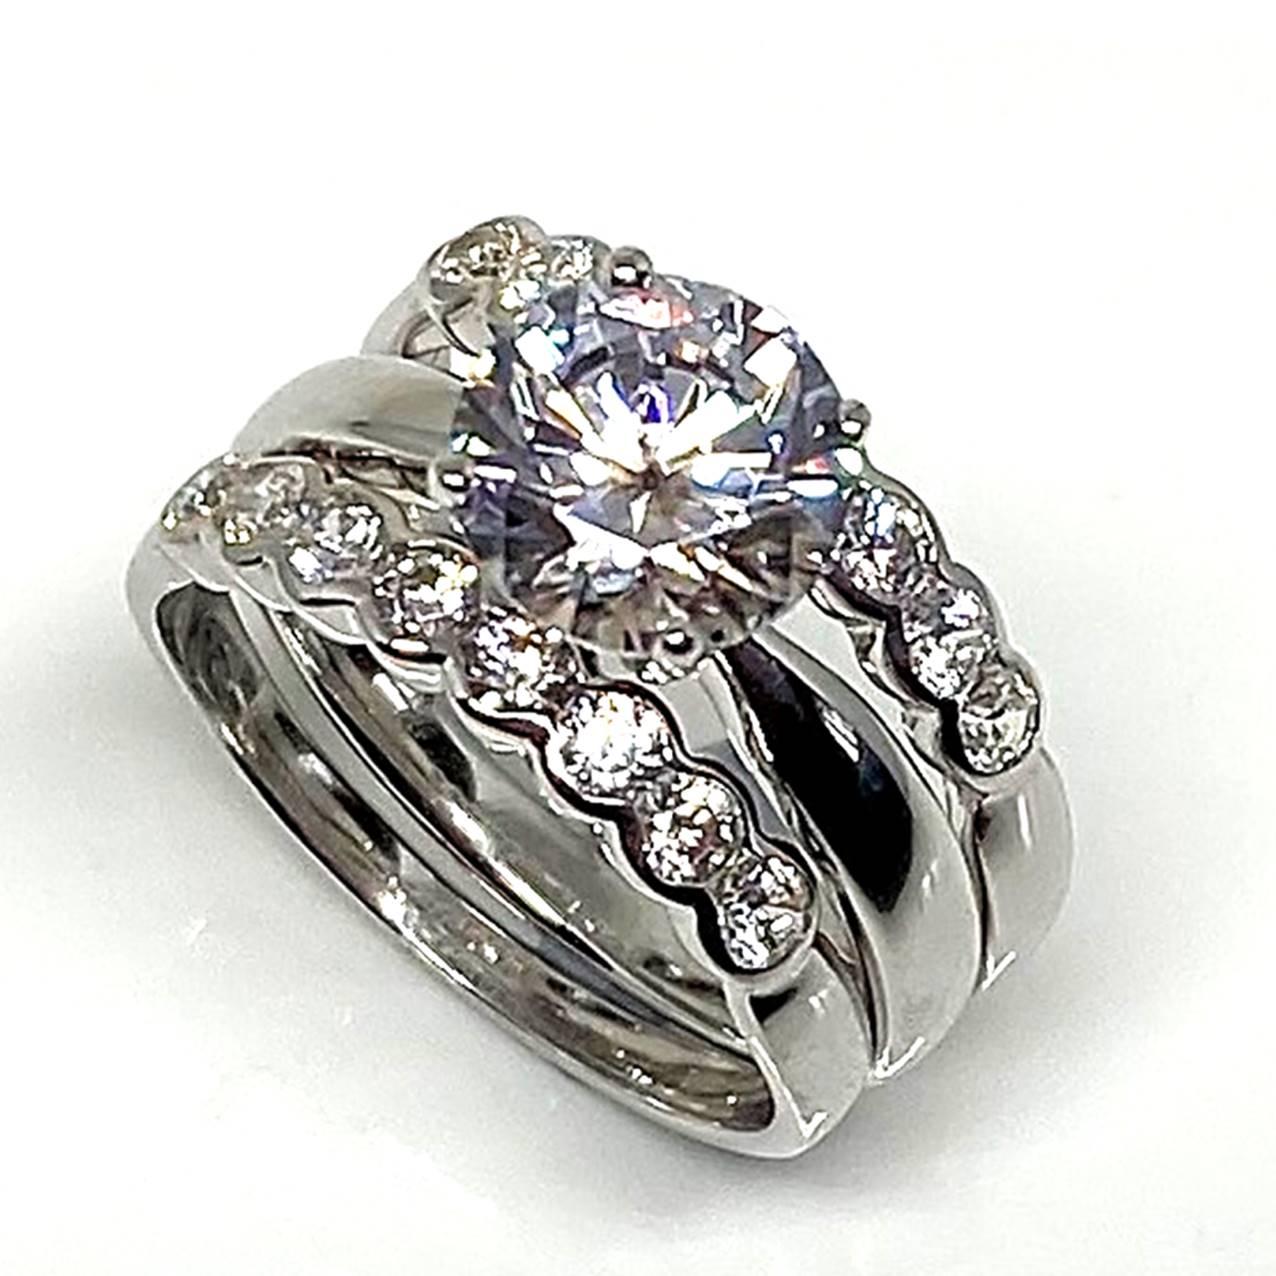 Buy Dummy Engagement Ring Online